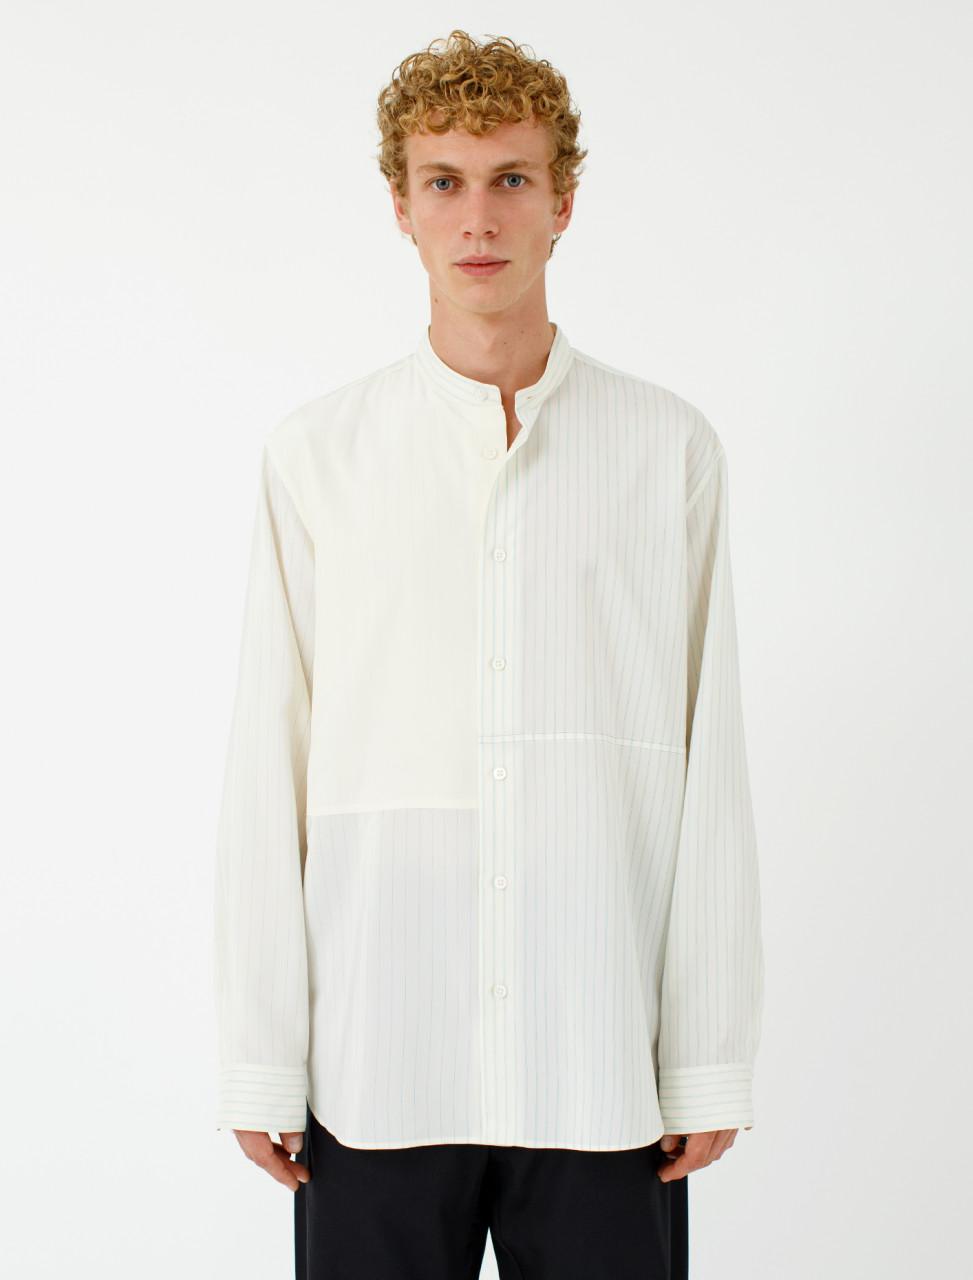 Silk Blend Shirt in Open White